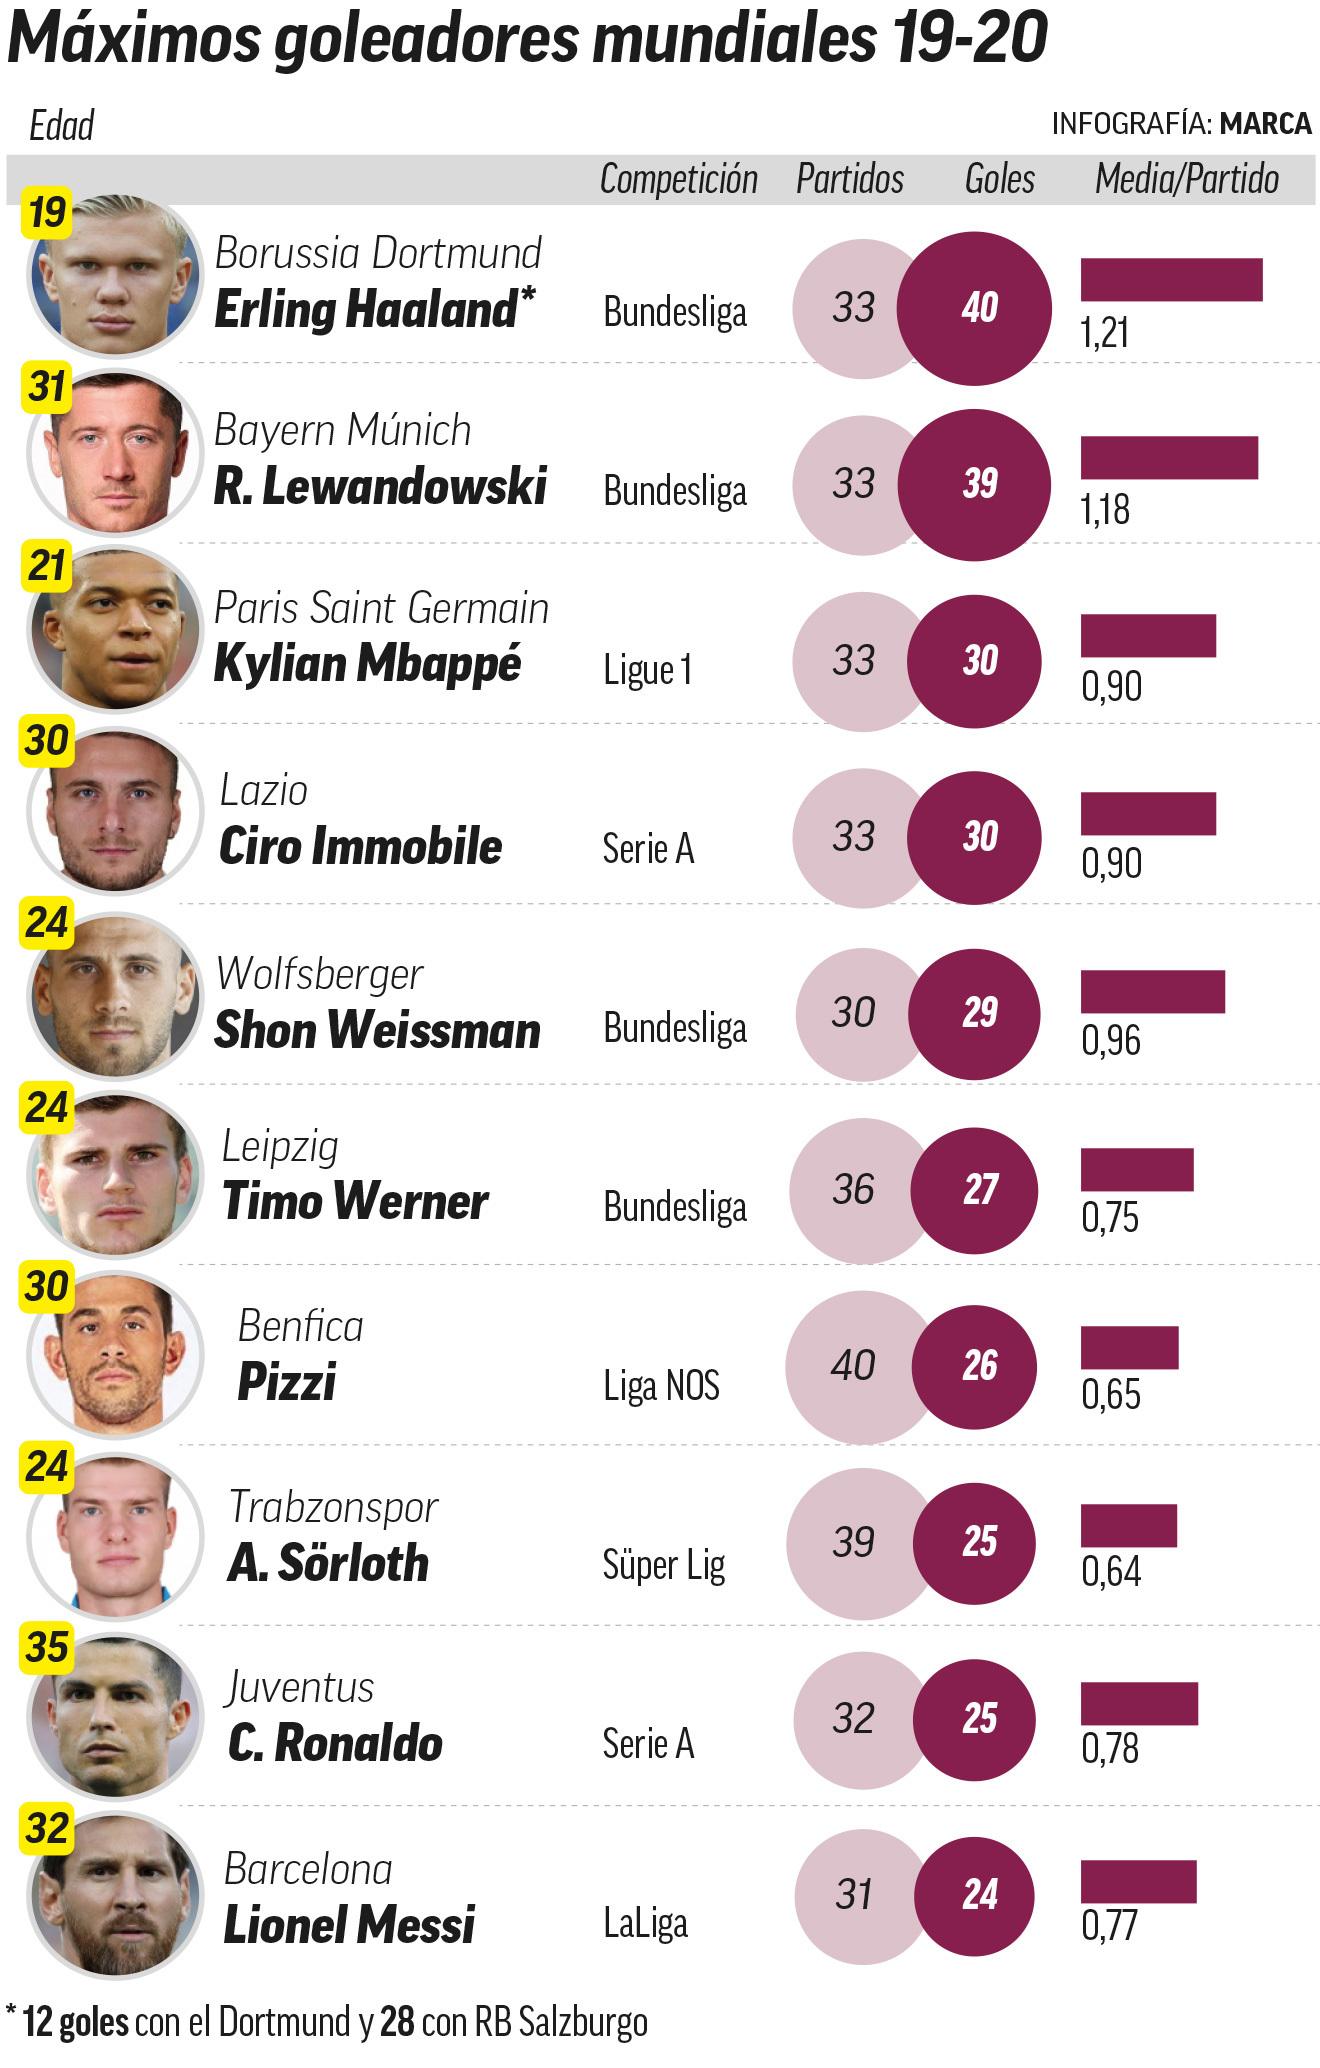 Haaland: The most potent goalscorer on the planet - Bóng Đá